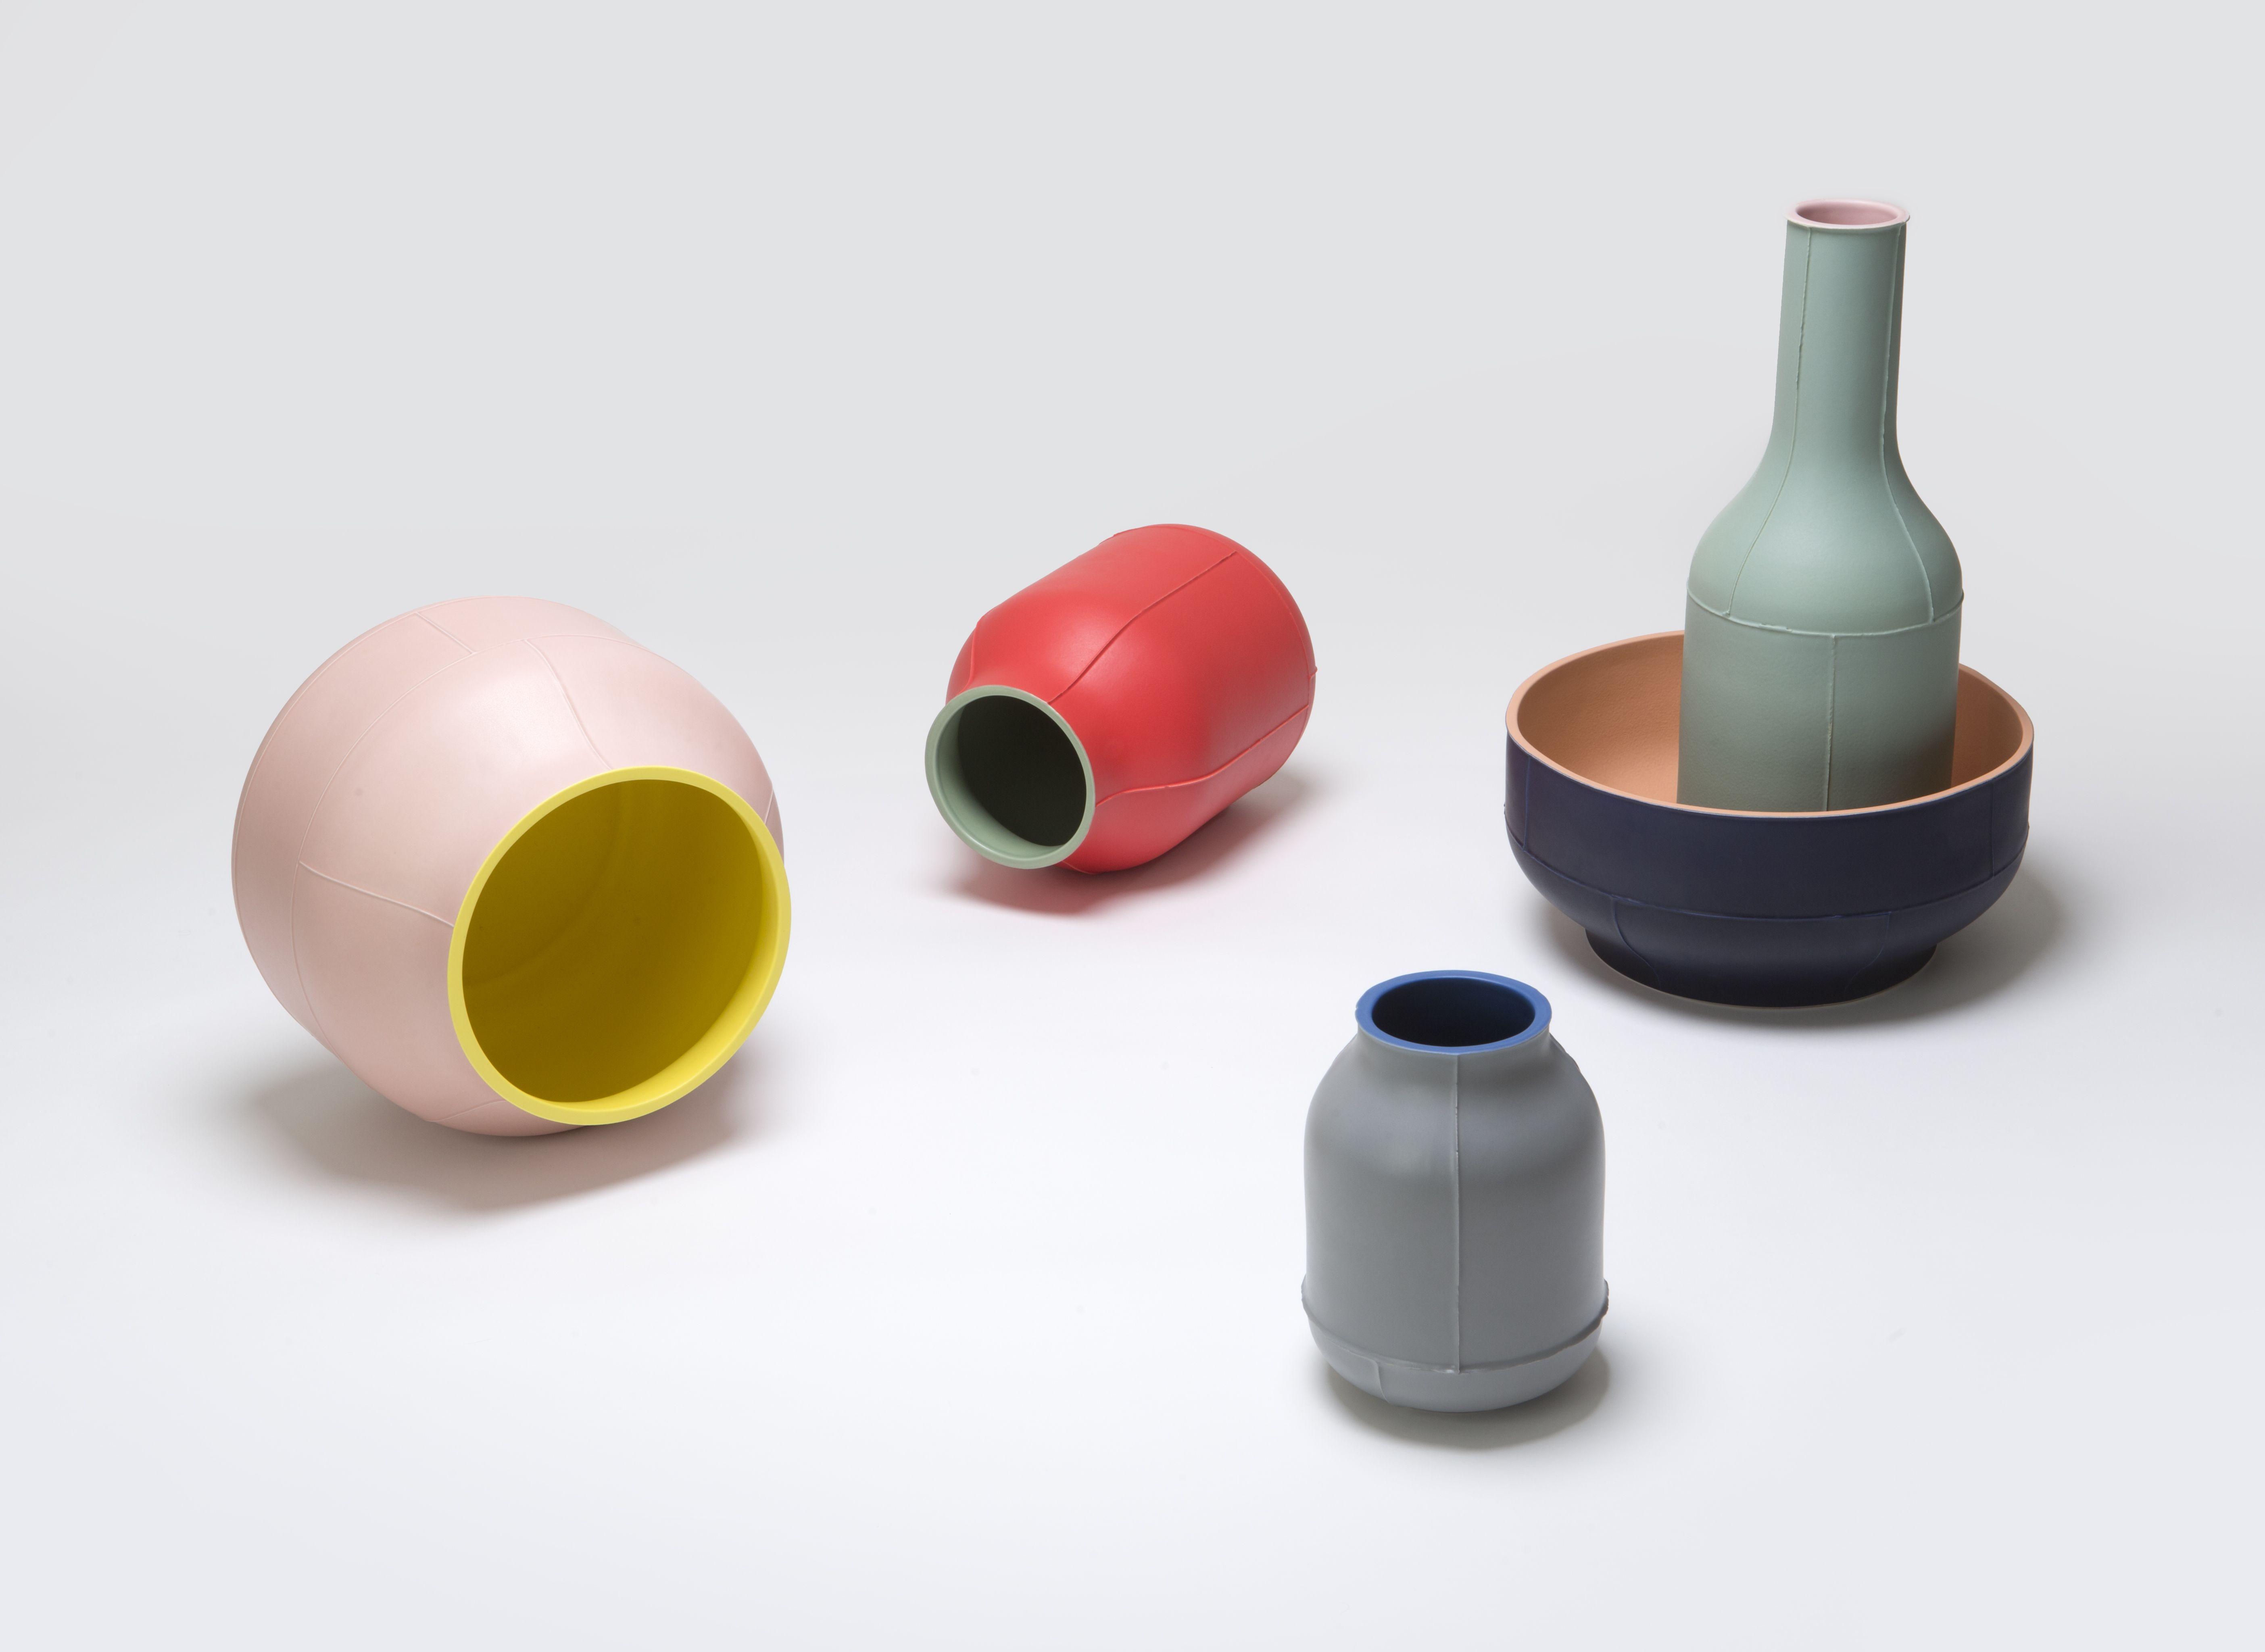 Ldf14 Seams By Benjamin Hubert For Bitossi Ceramiche Ceramic Tableware Traditional Ceramics Ceramics